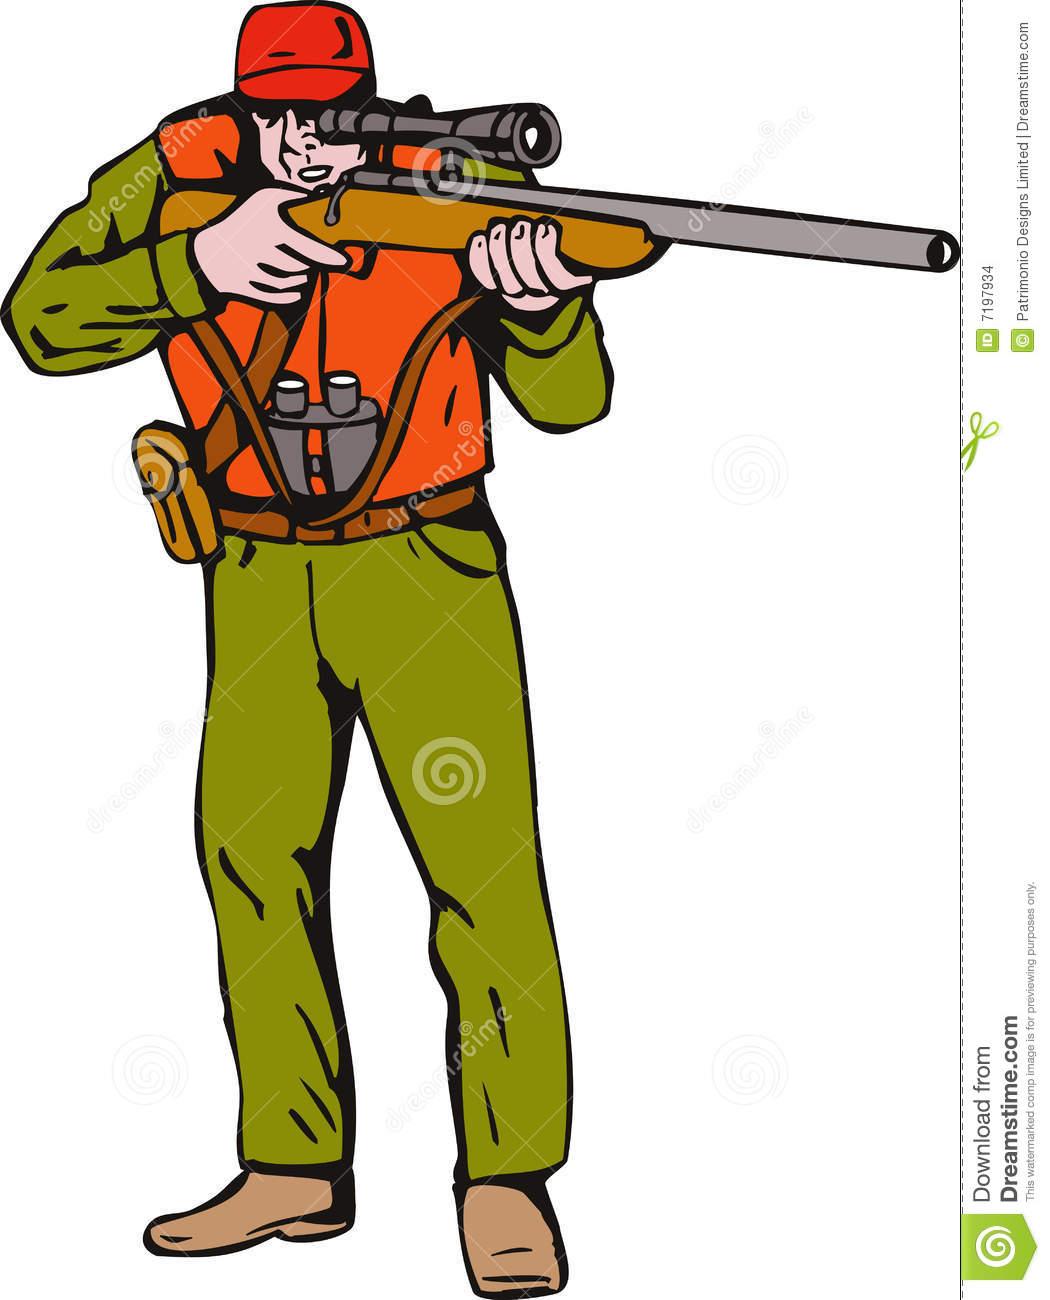 Hunter clipart - Clipground